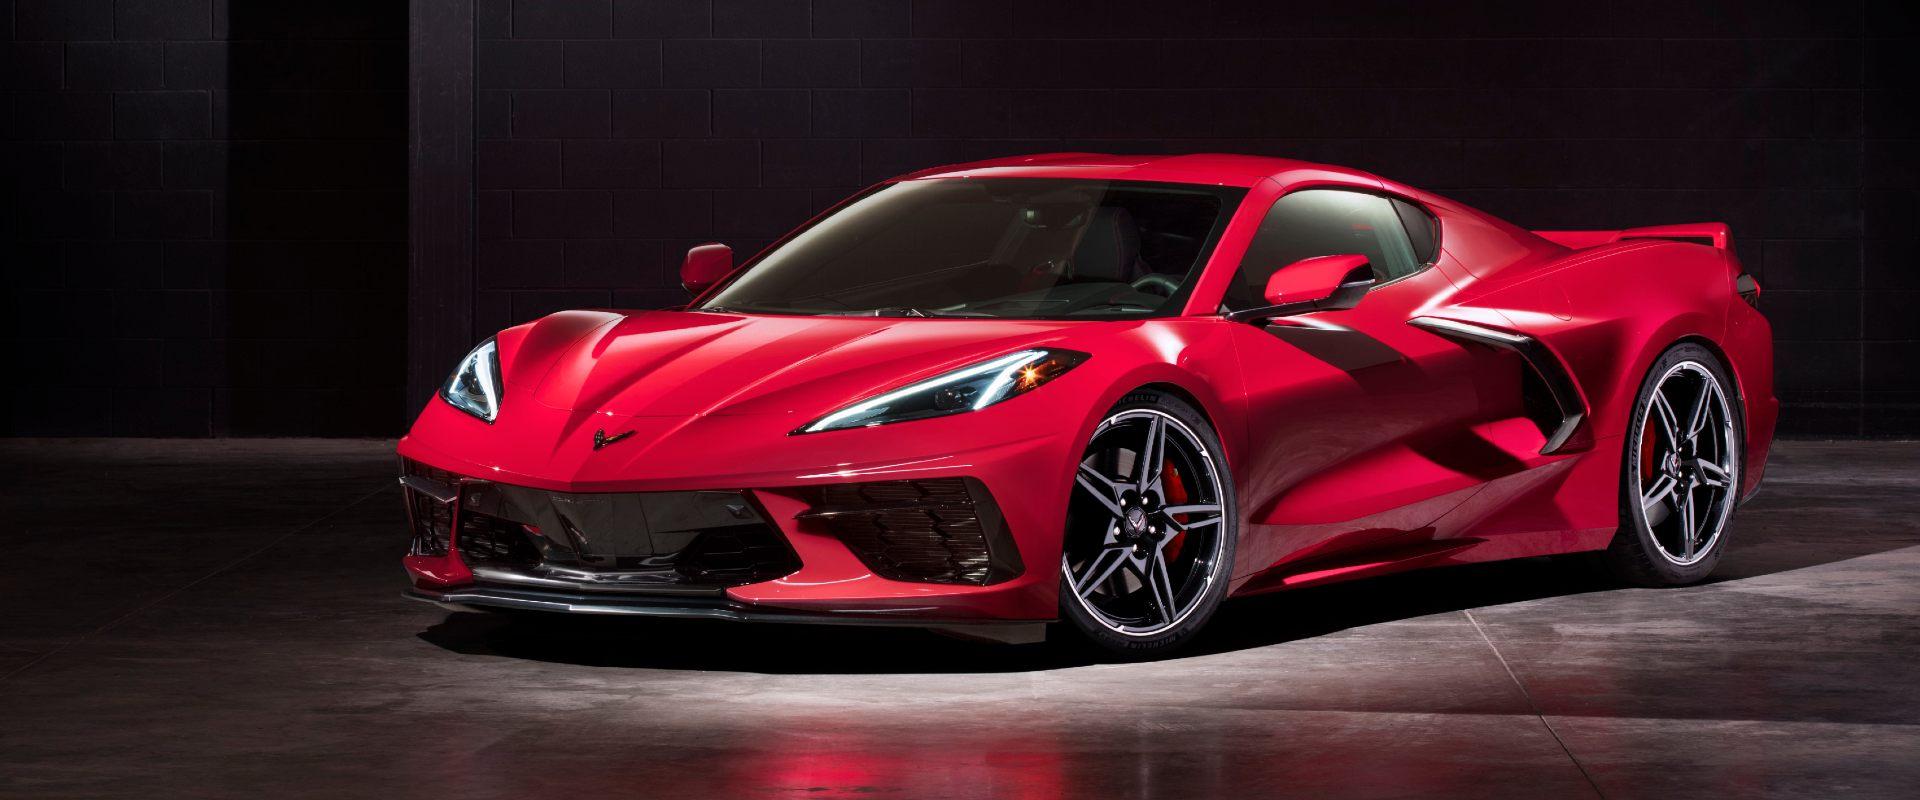 Nová Corvette C8 Stingray - príjem objednávok!